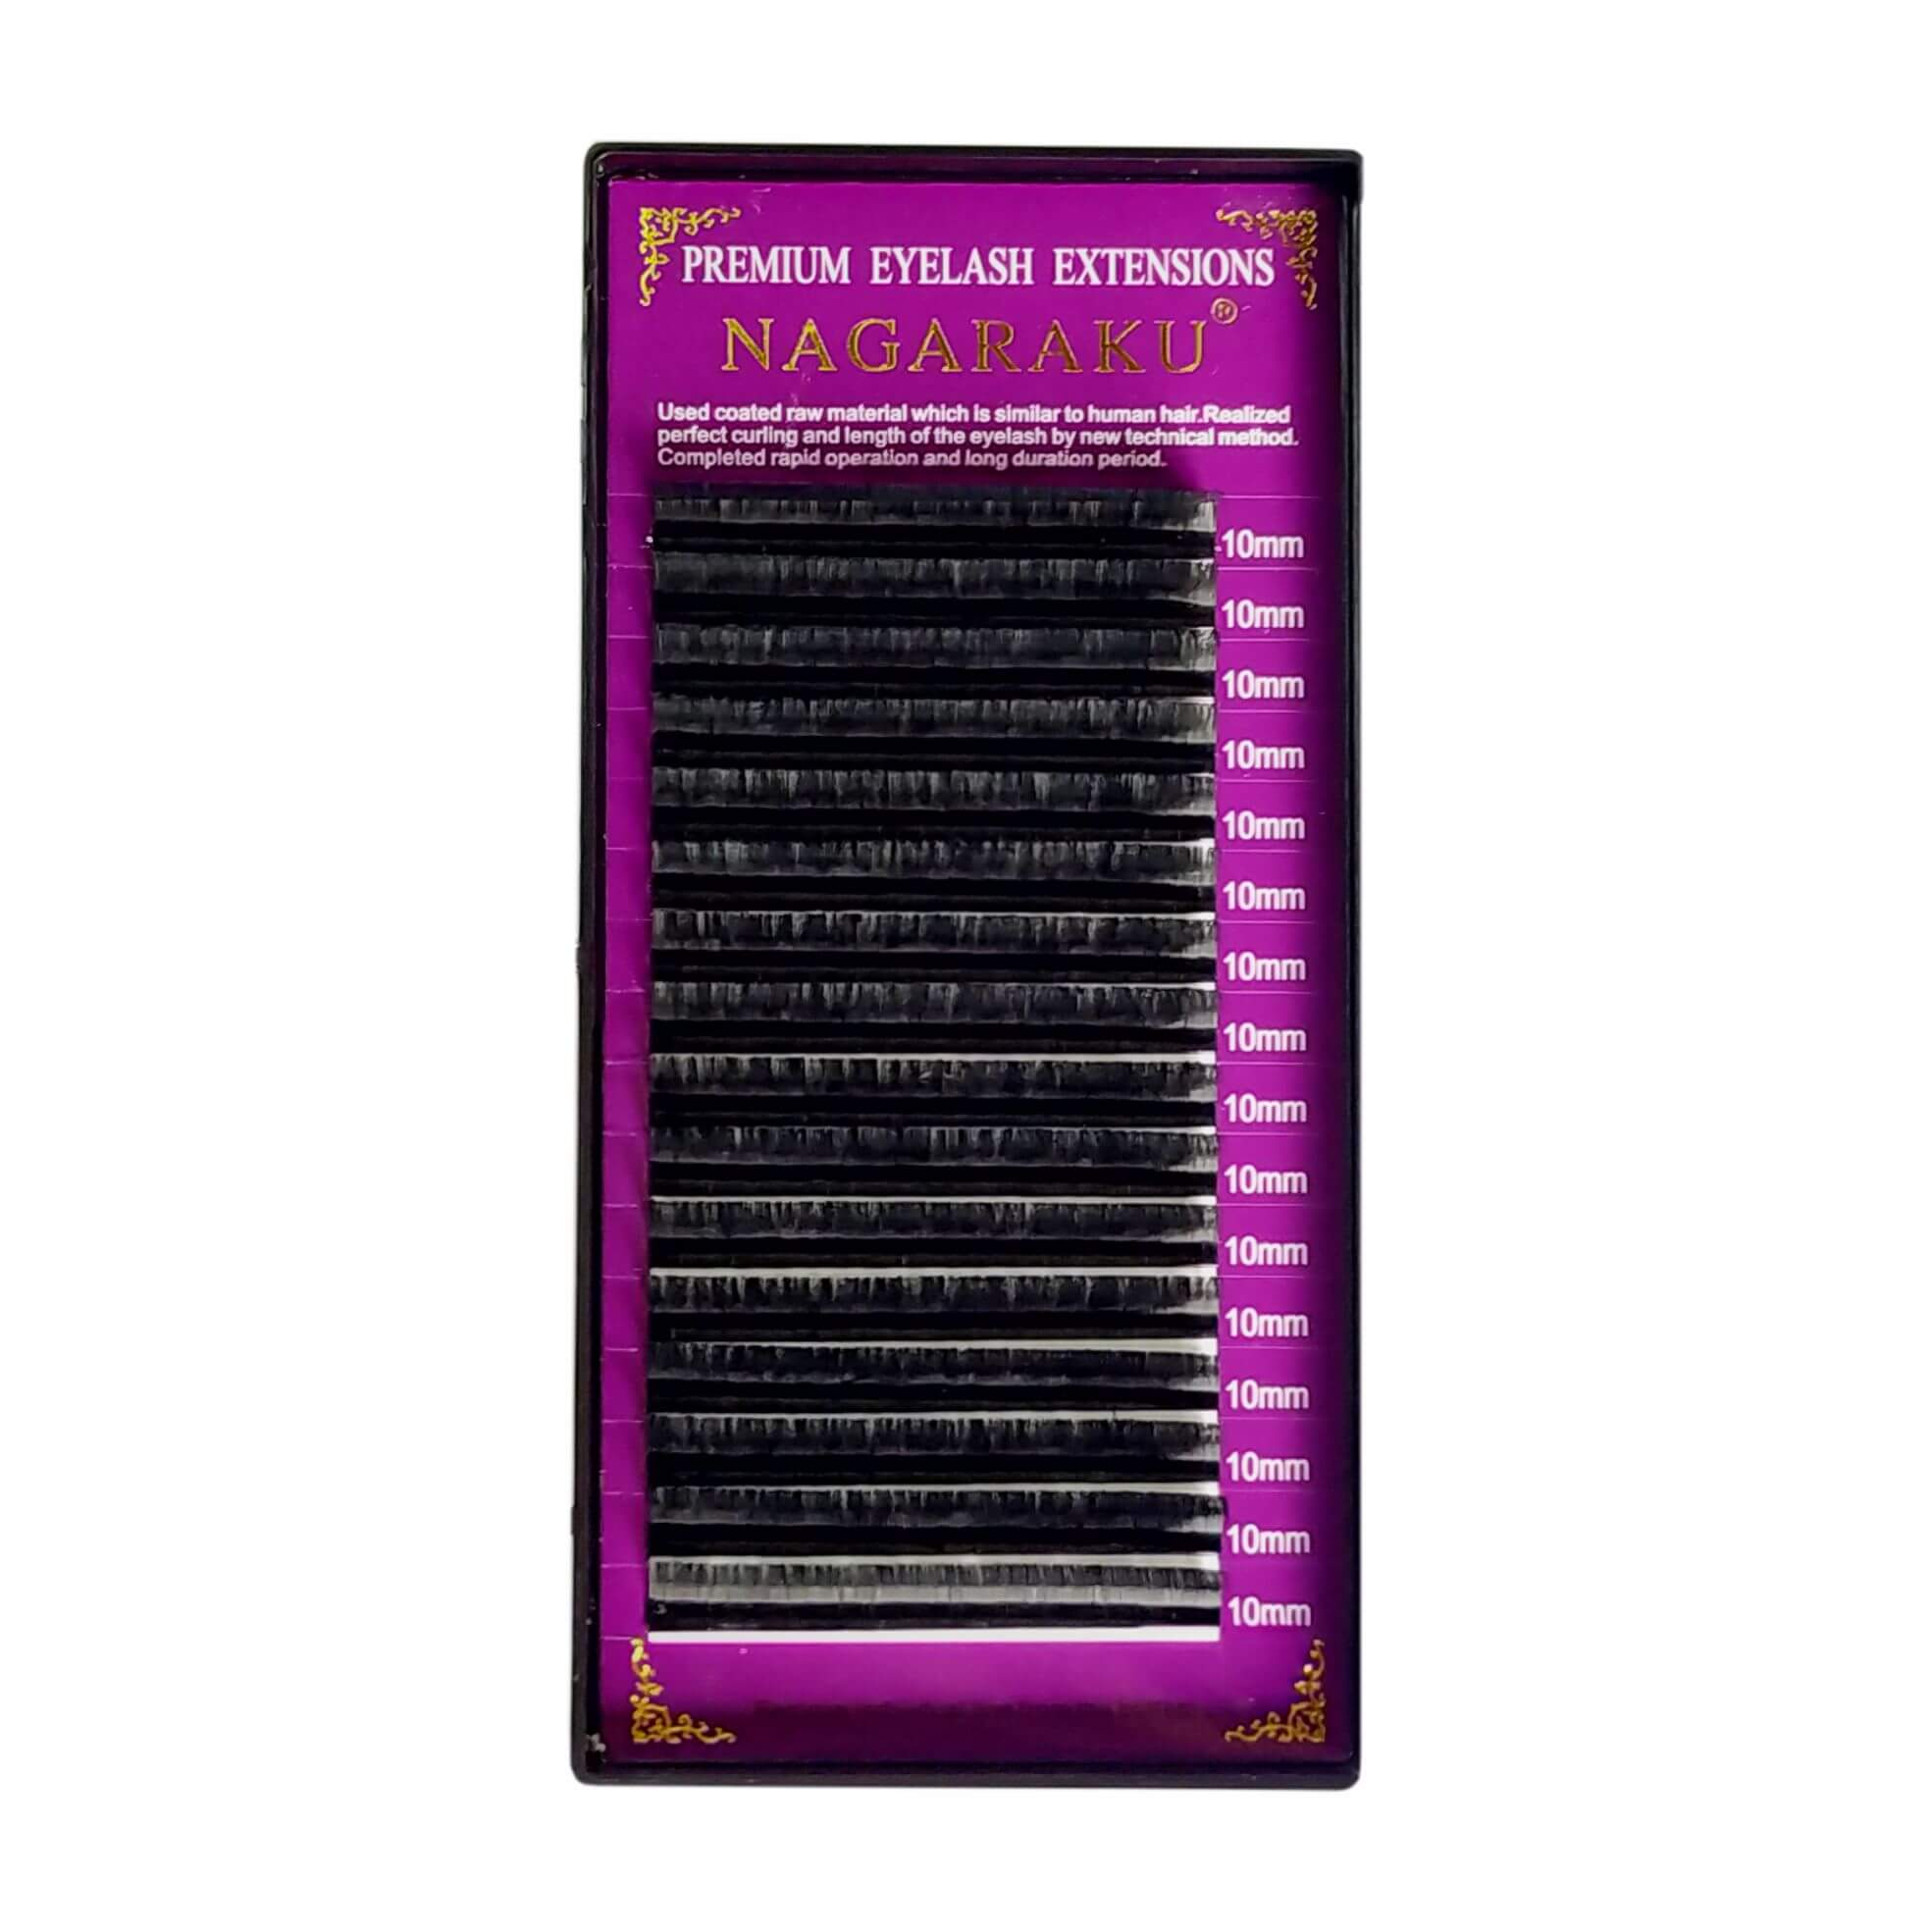 Cílios Nagaraku Premium Volume Russo 10mm 0.07D